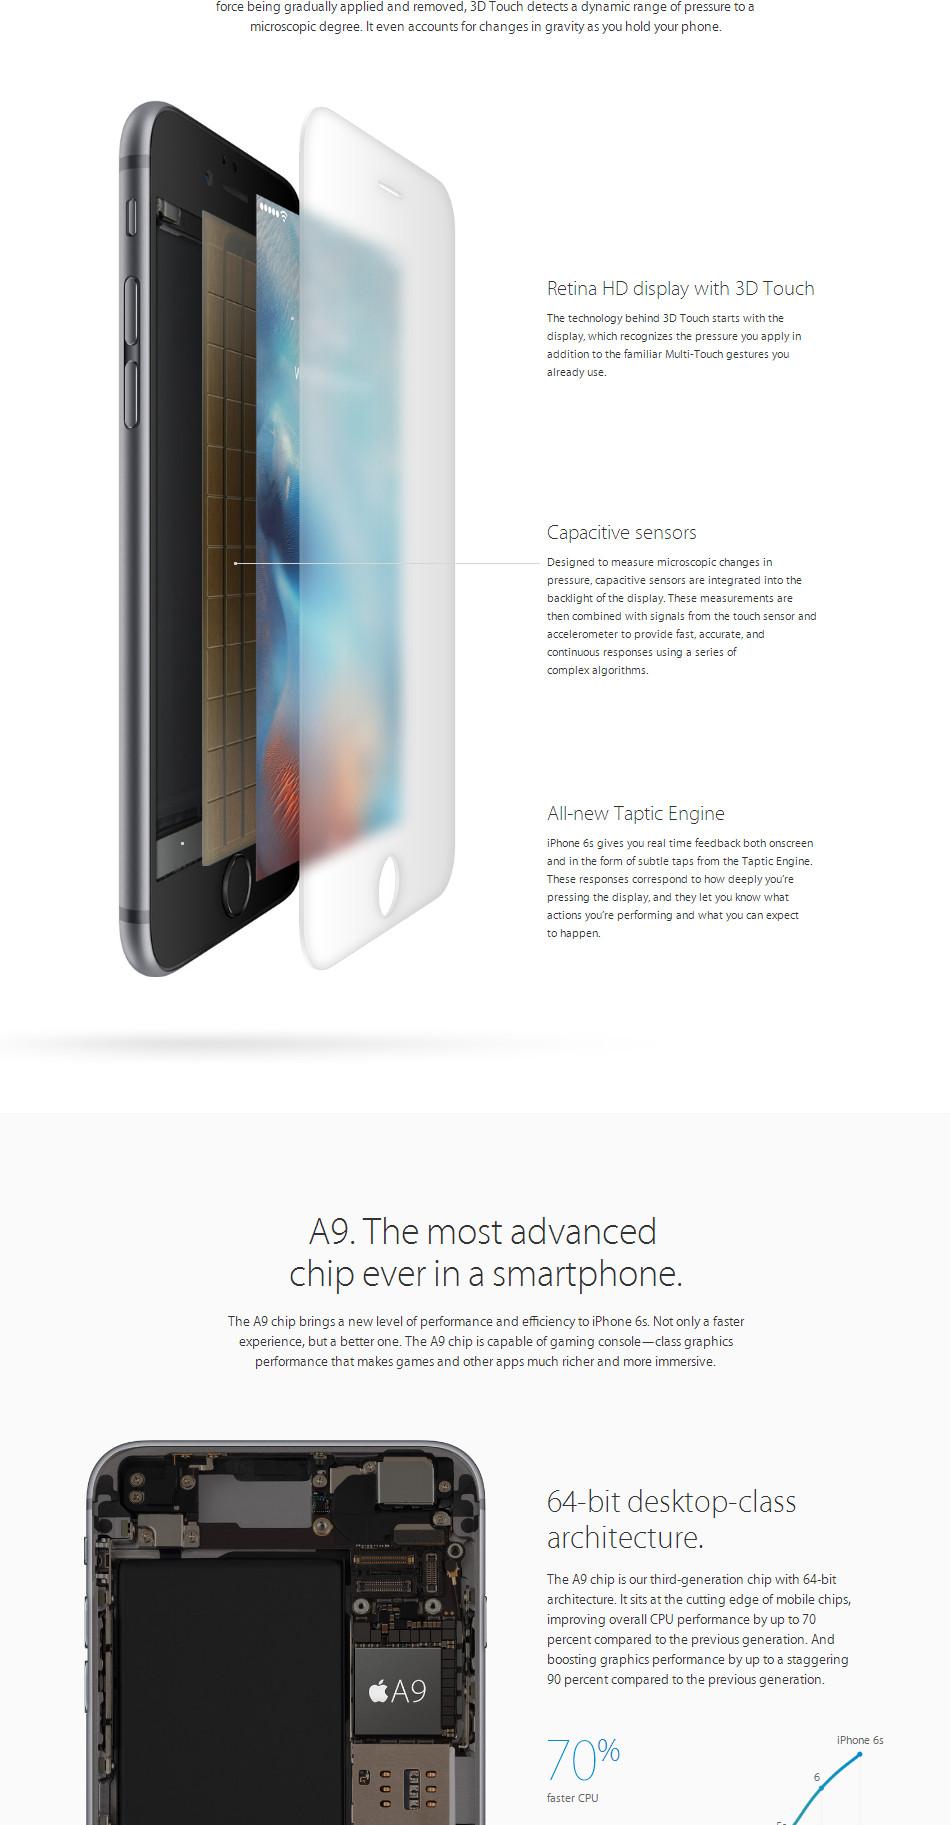 iPhone-6s_10